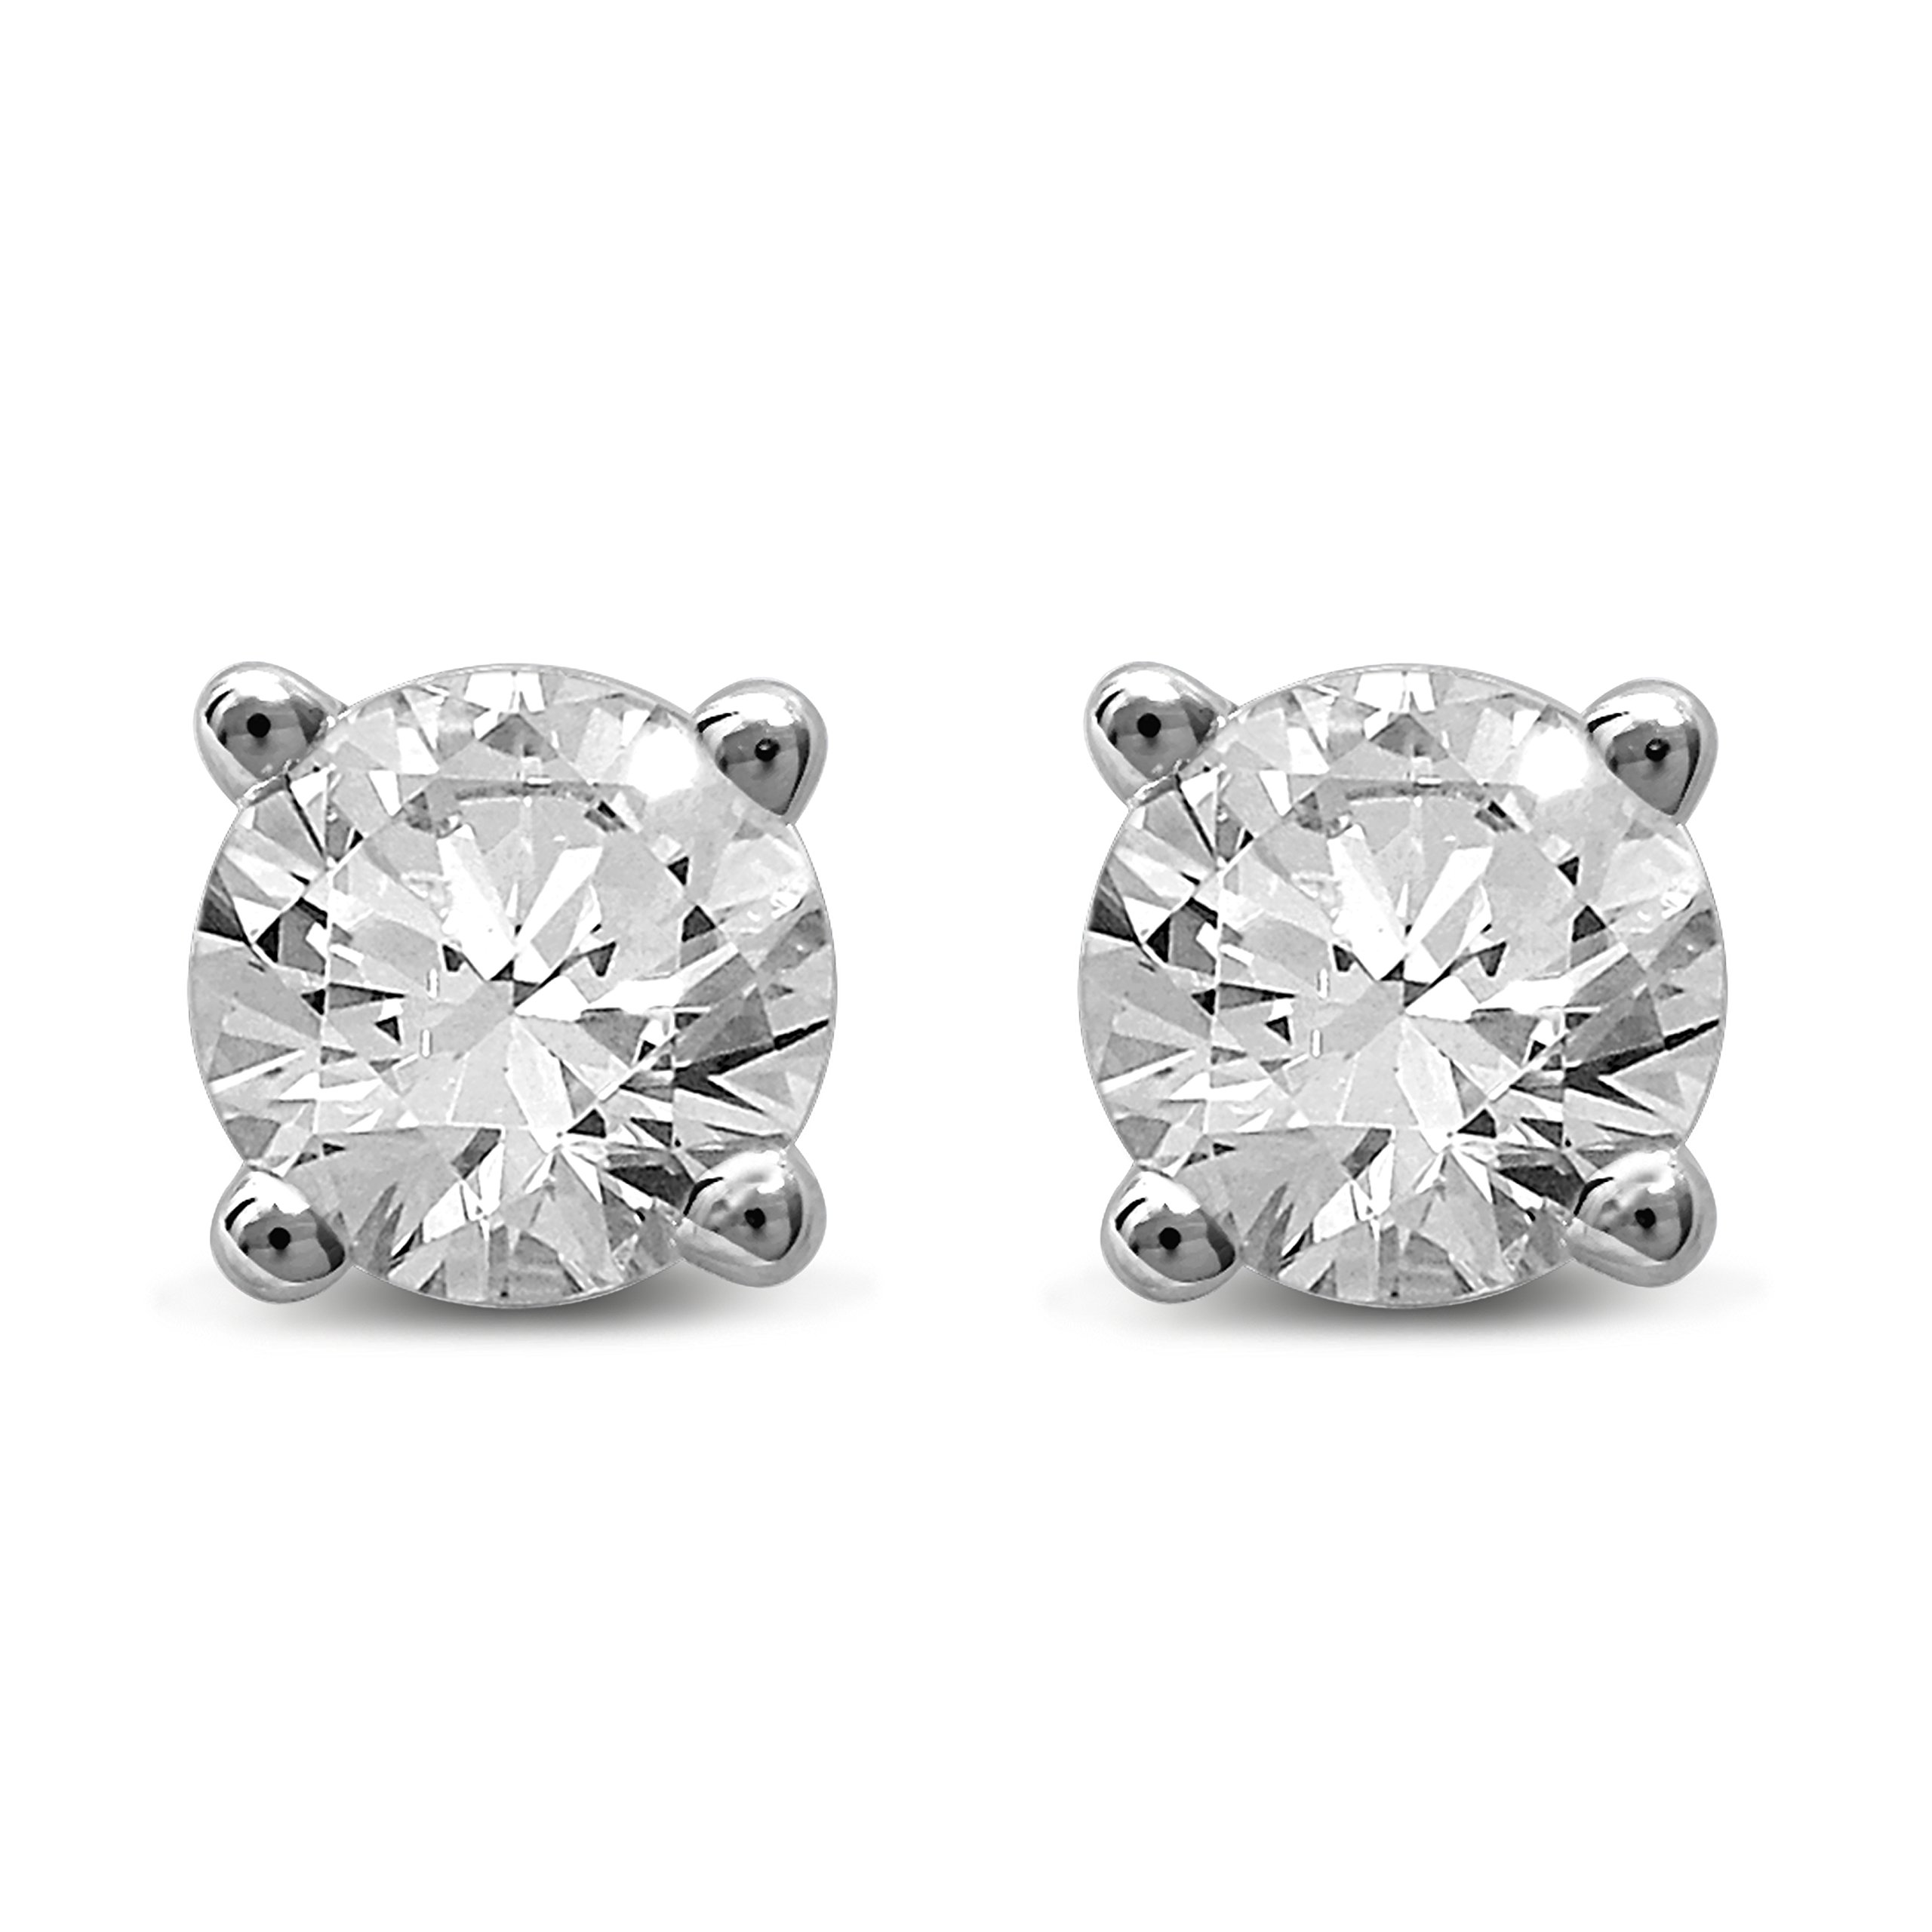 Diamond Jewel IGI Certified 14K Round Diamond Stud Earrings Sale Great Value ... (.5)